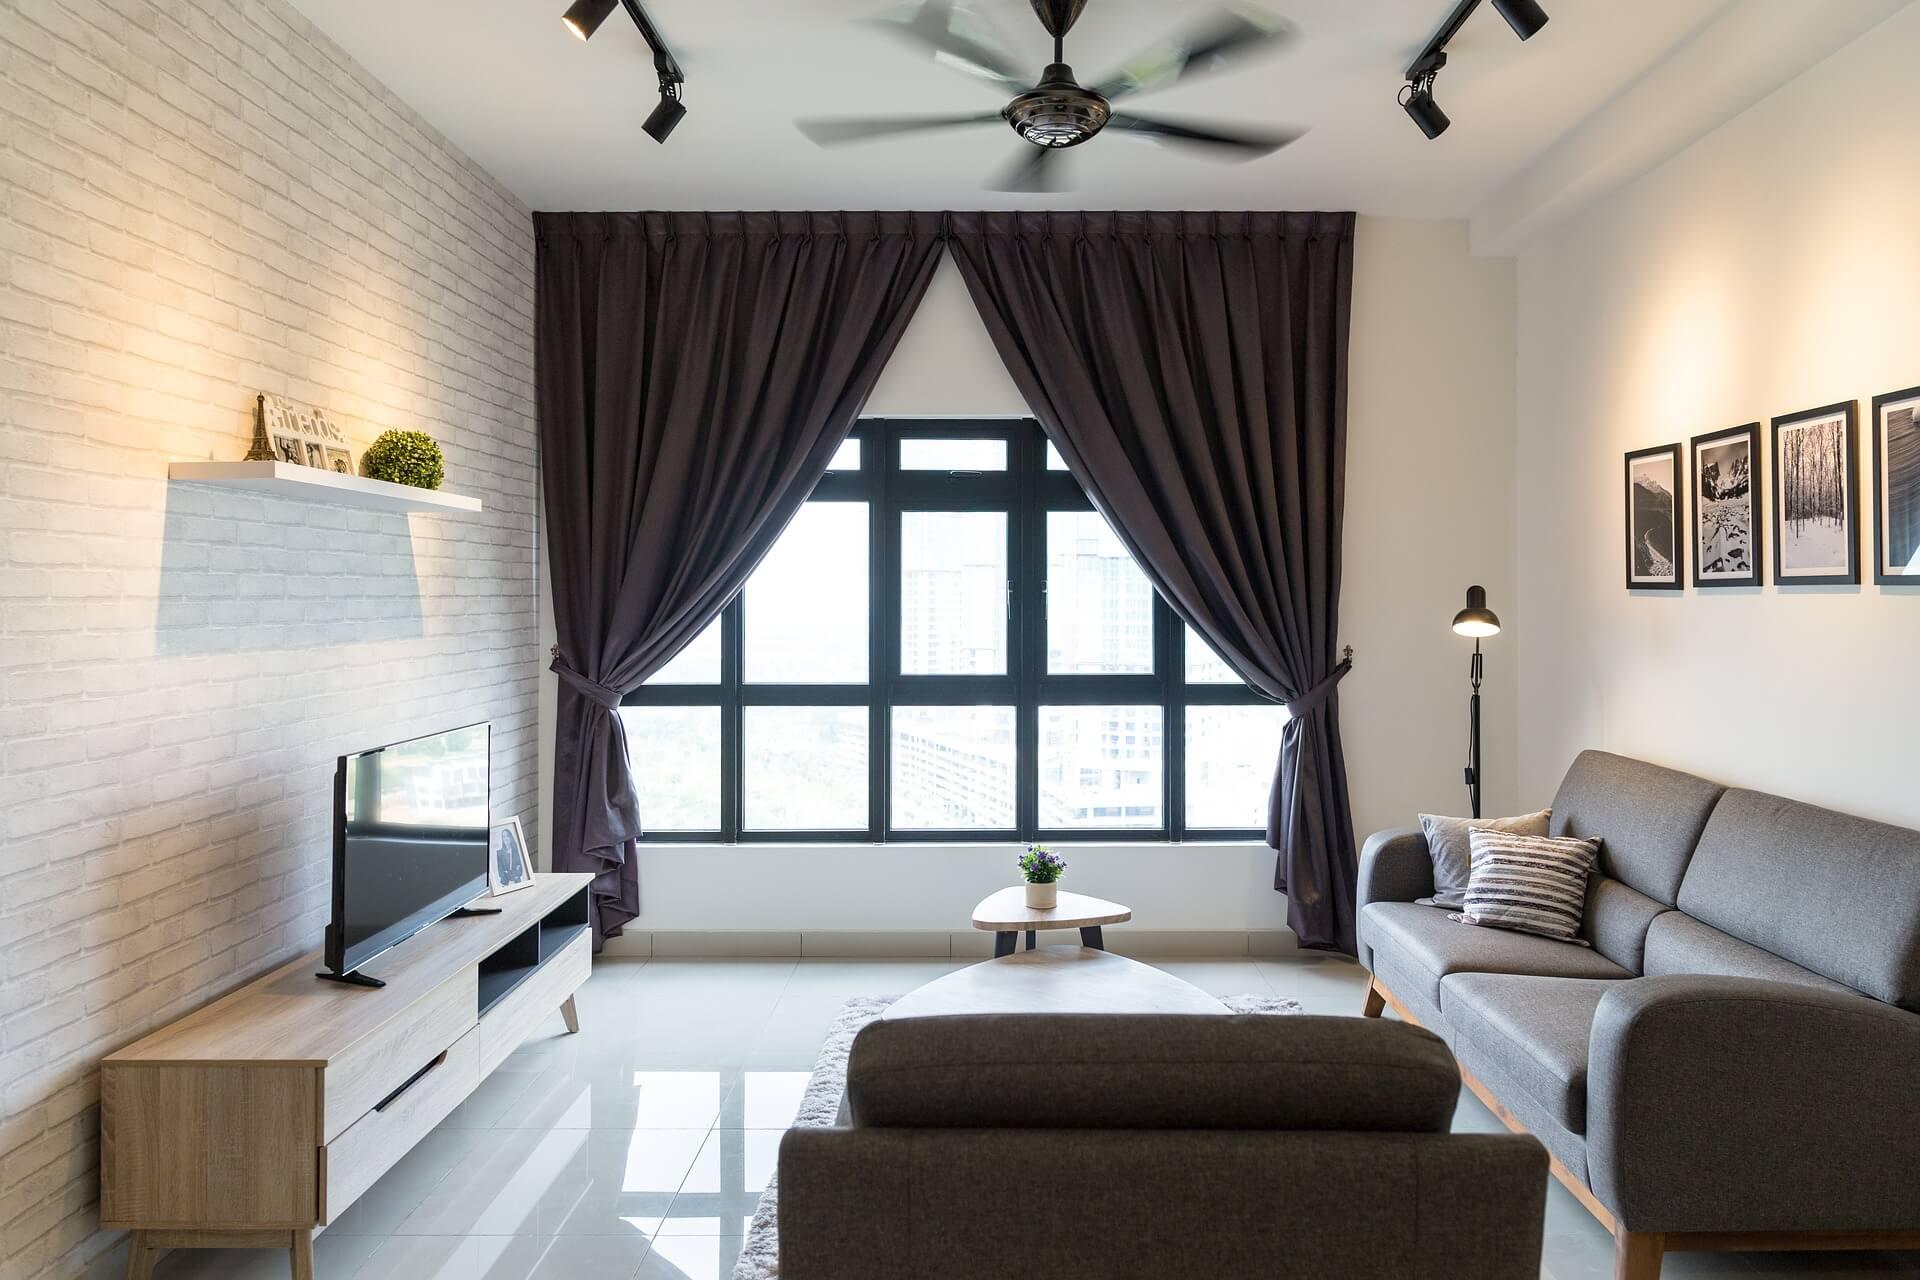 Bohemian Home Decor And Interior Design Ideas Interior Design